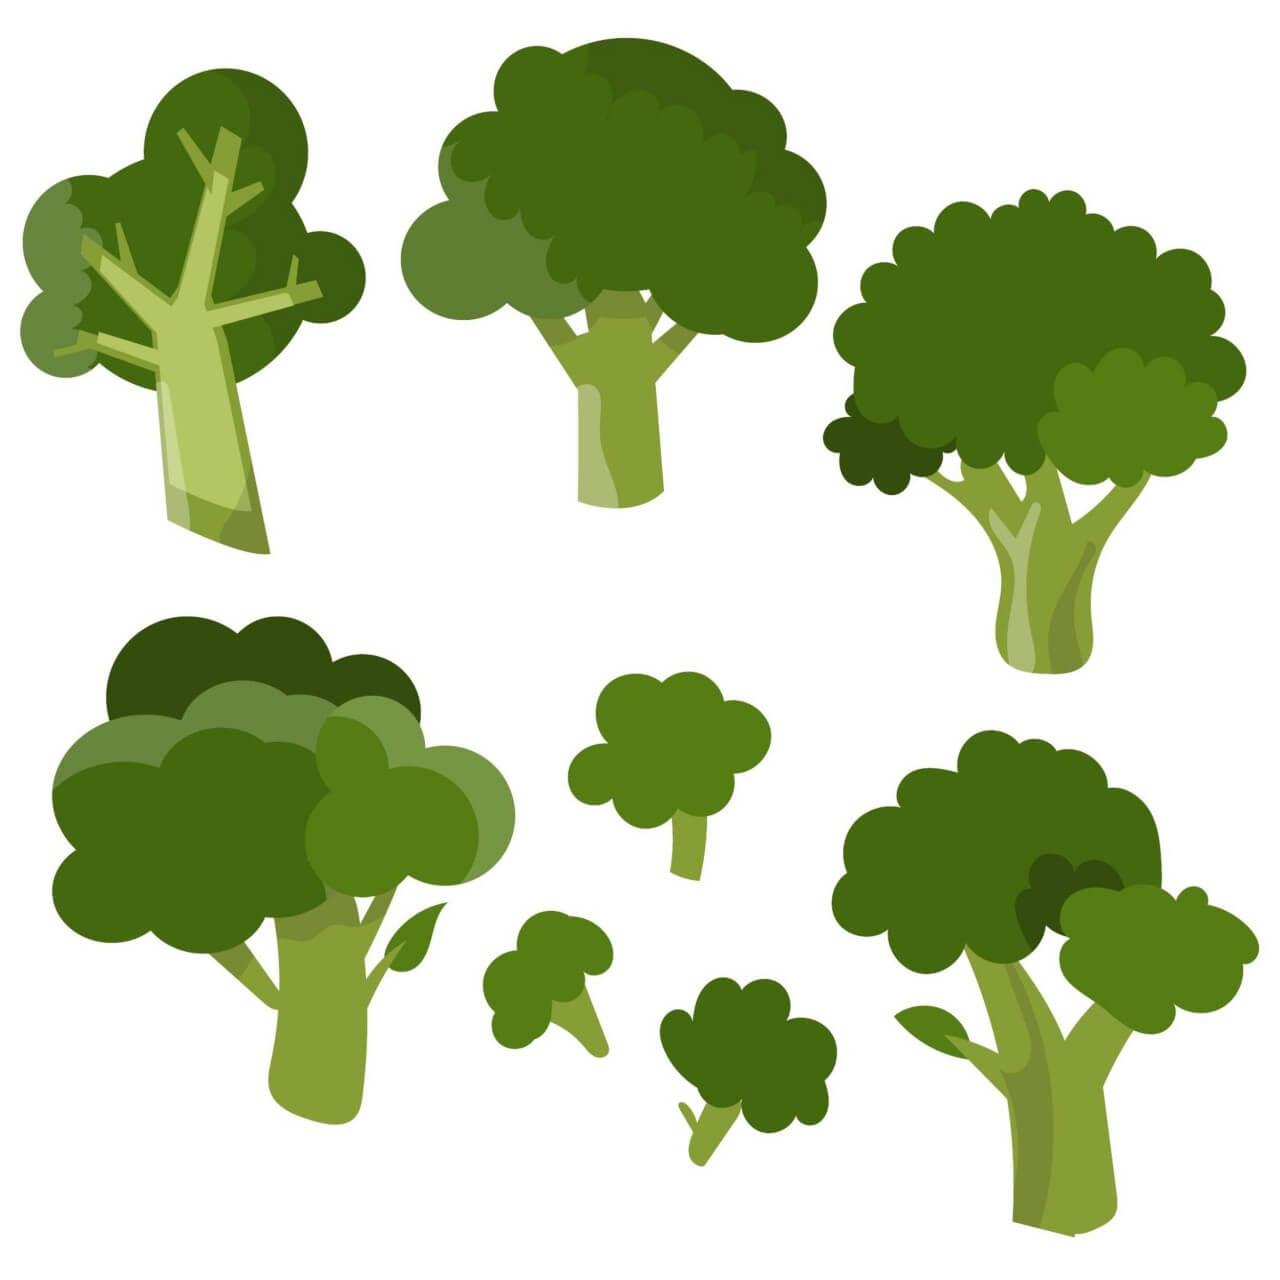 free vector fresh broccoli vector set free vector fresh broccoli vector set